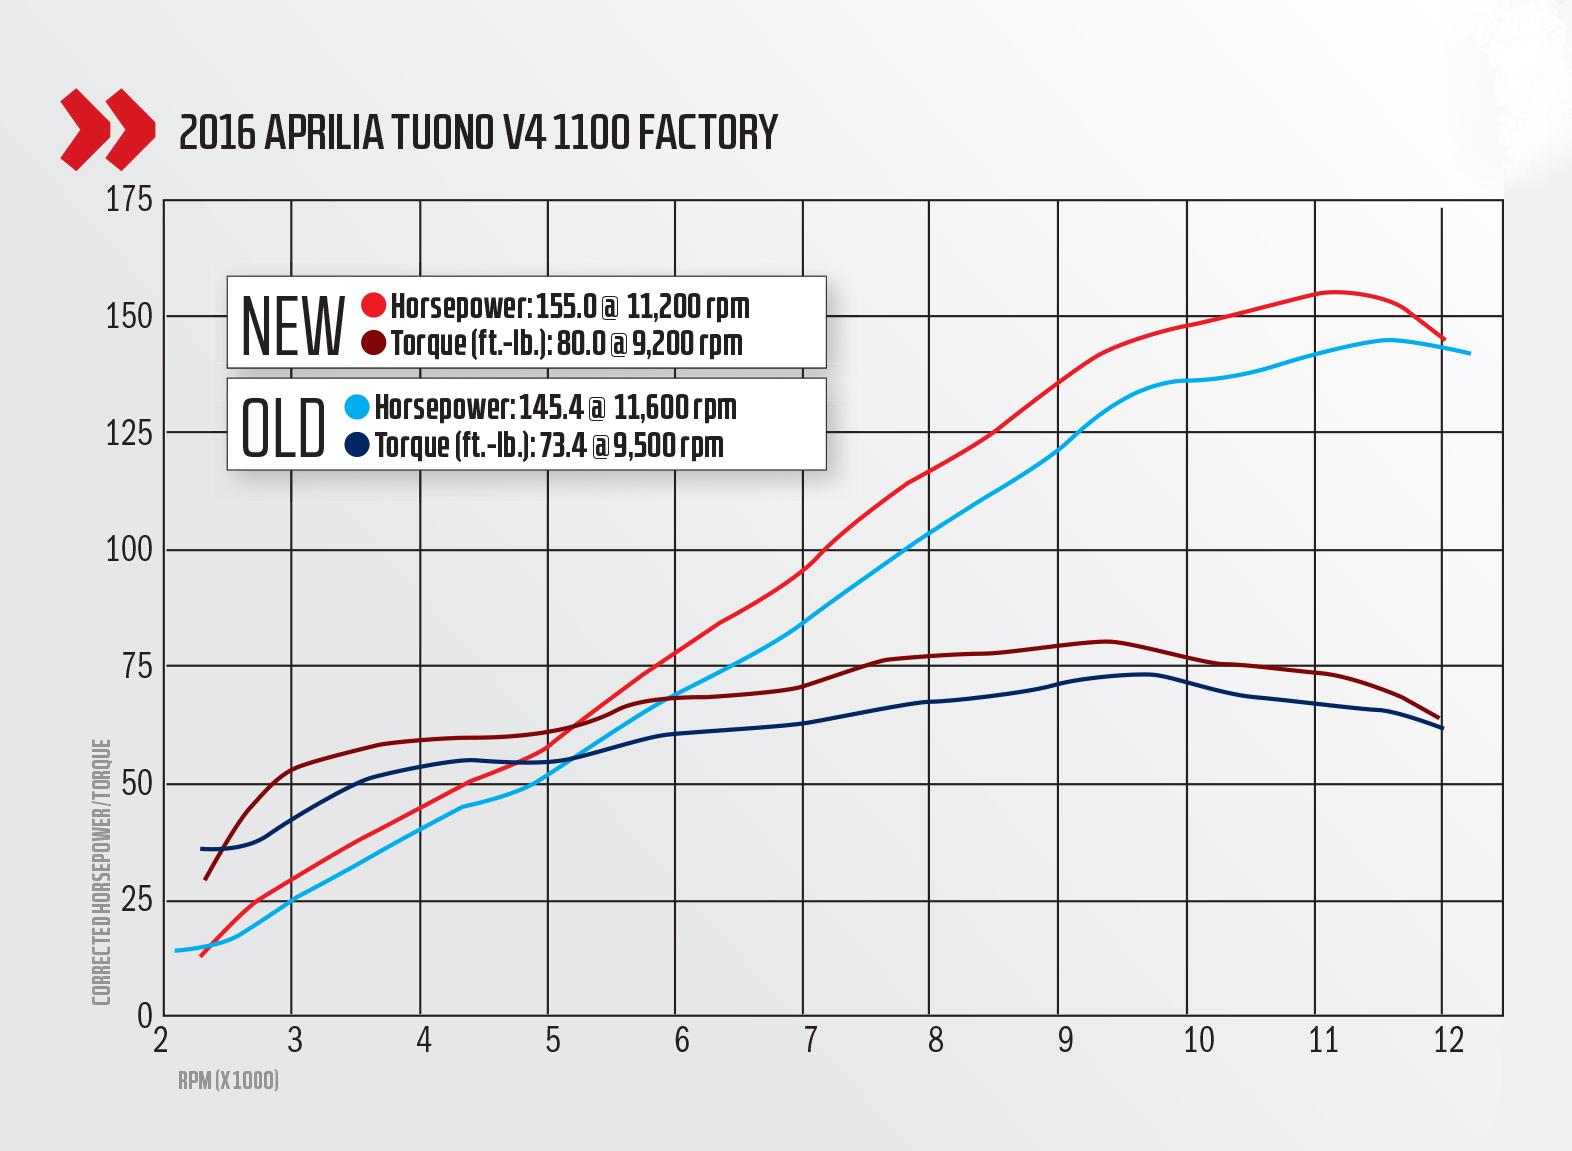 2016 Aprilia Tuono V4 1100 Factory Review Cycle World